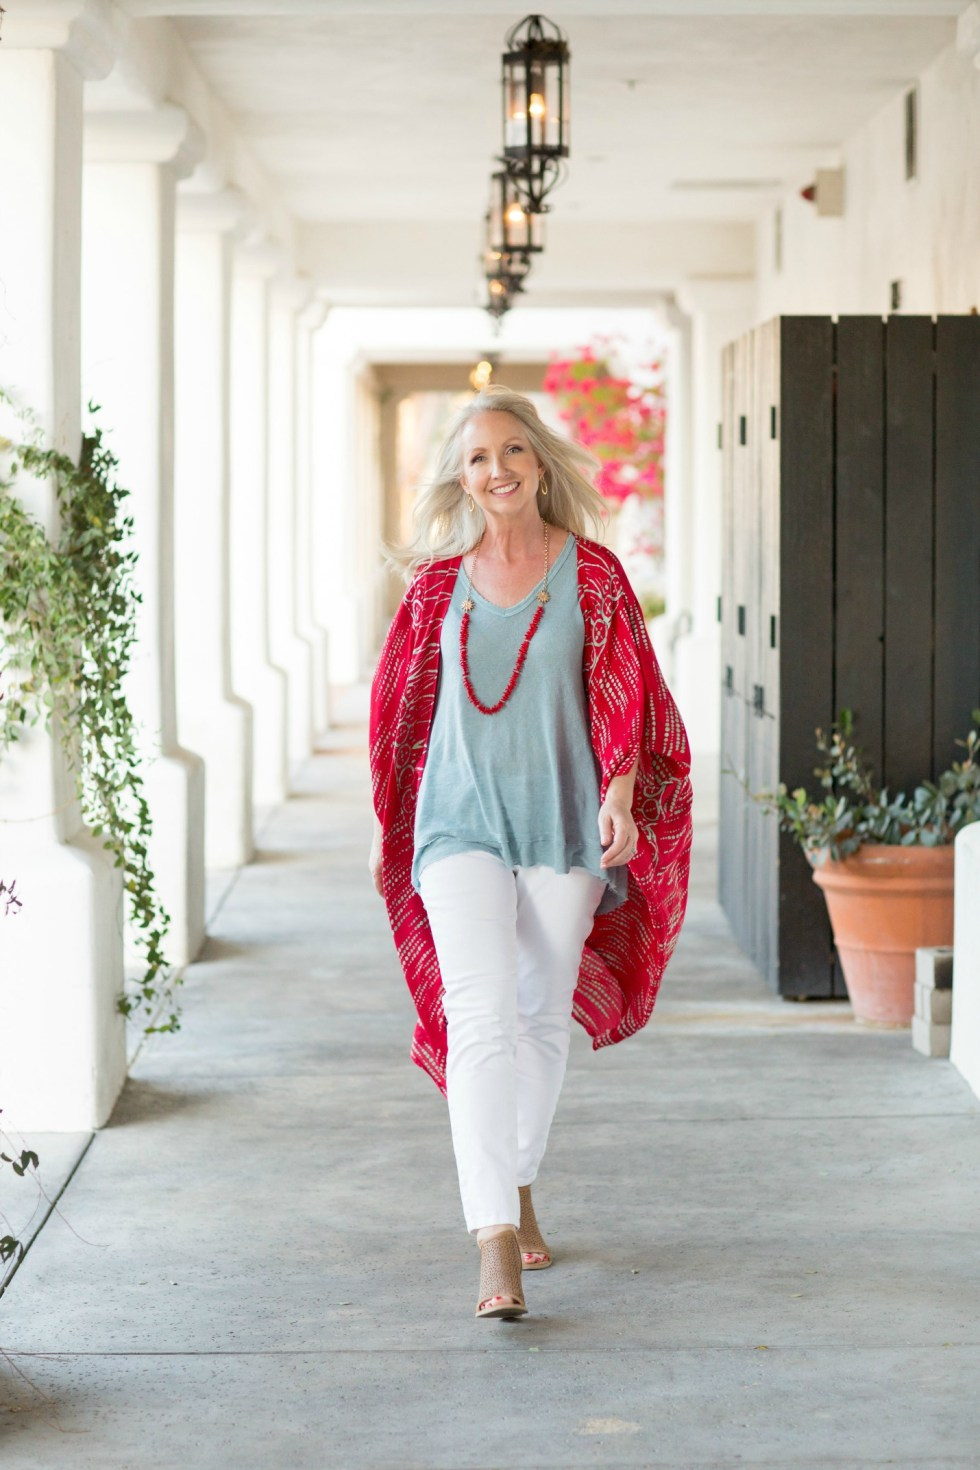 Kimono Red Aqua Top White Jeans